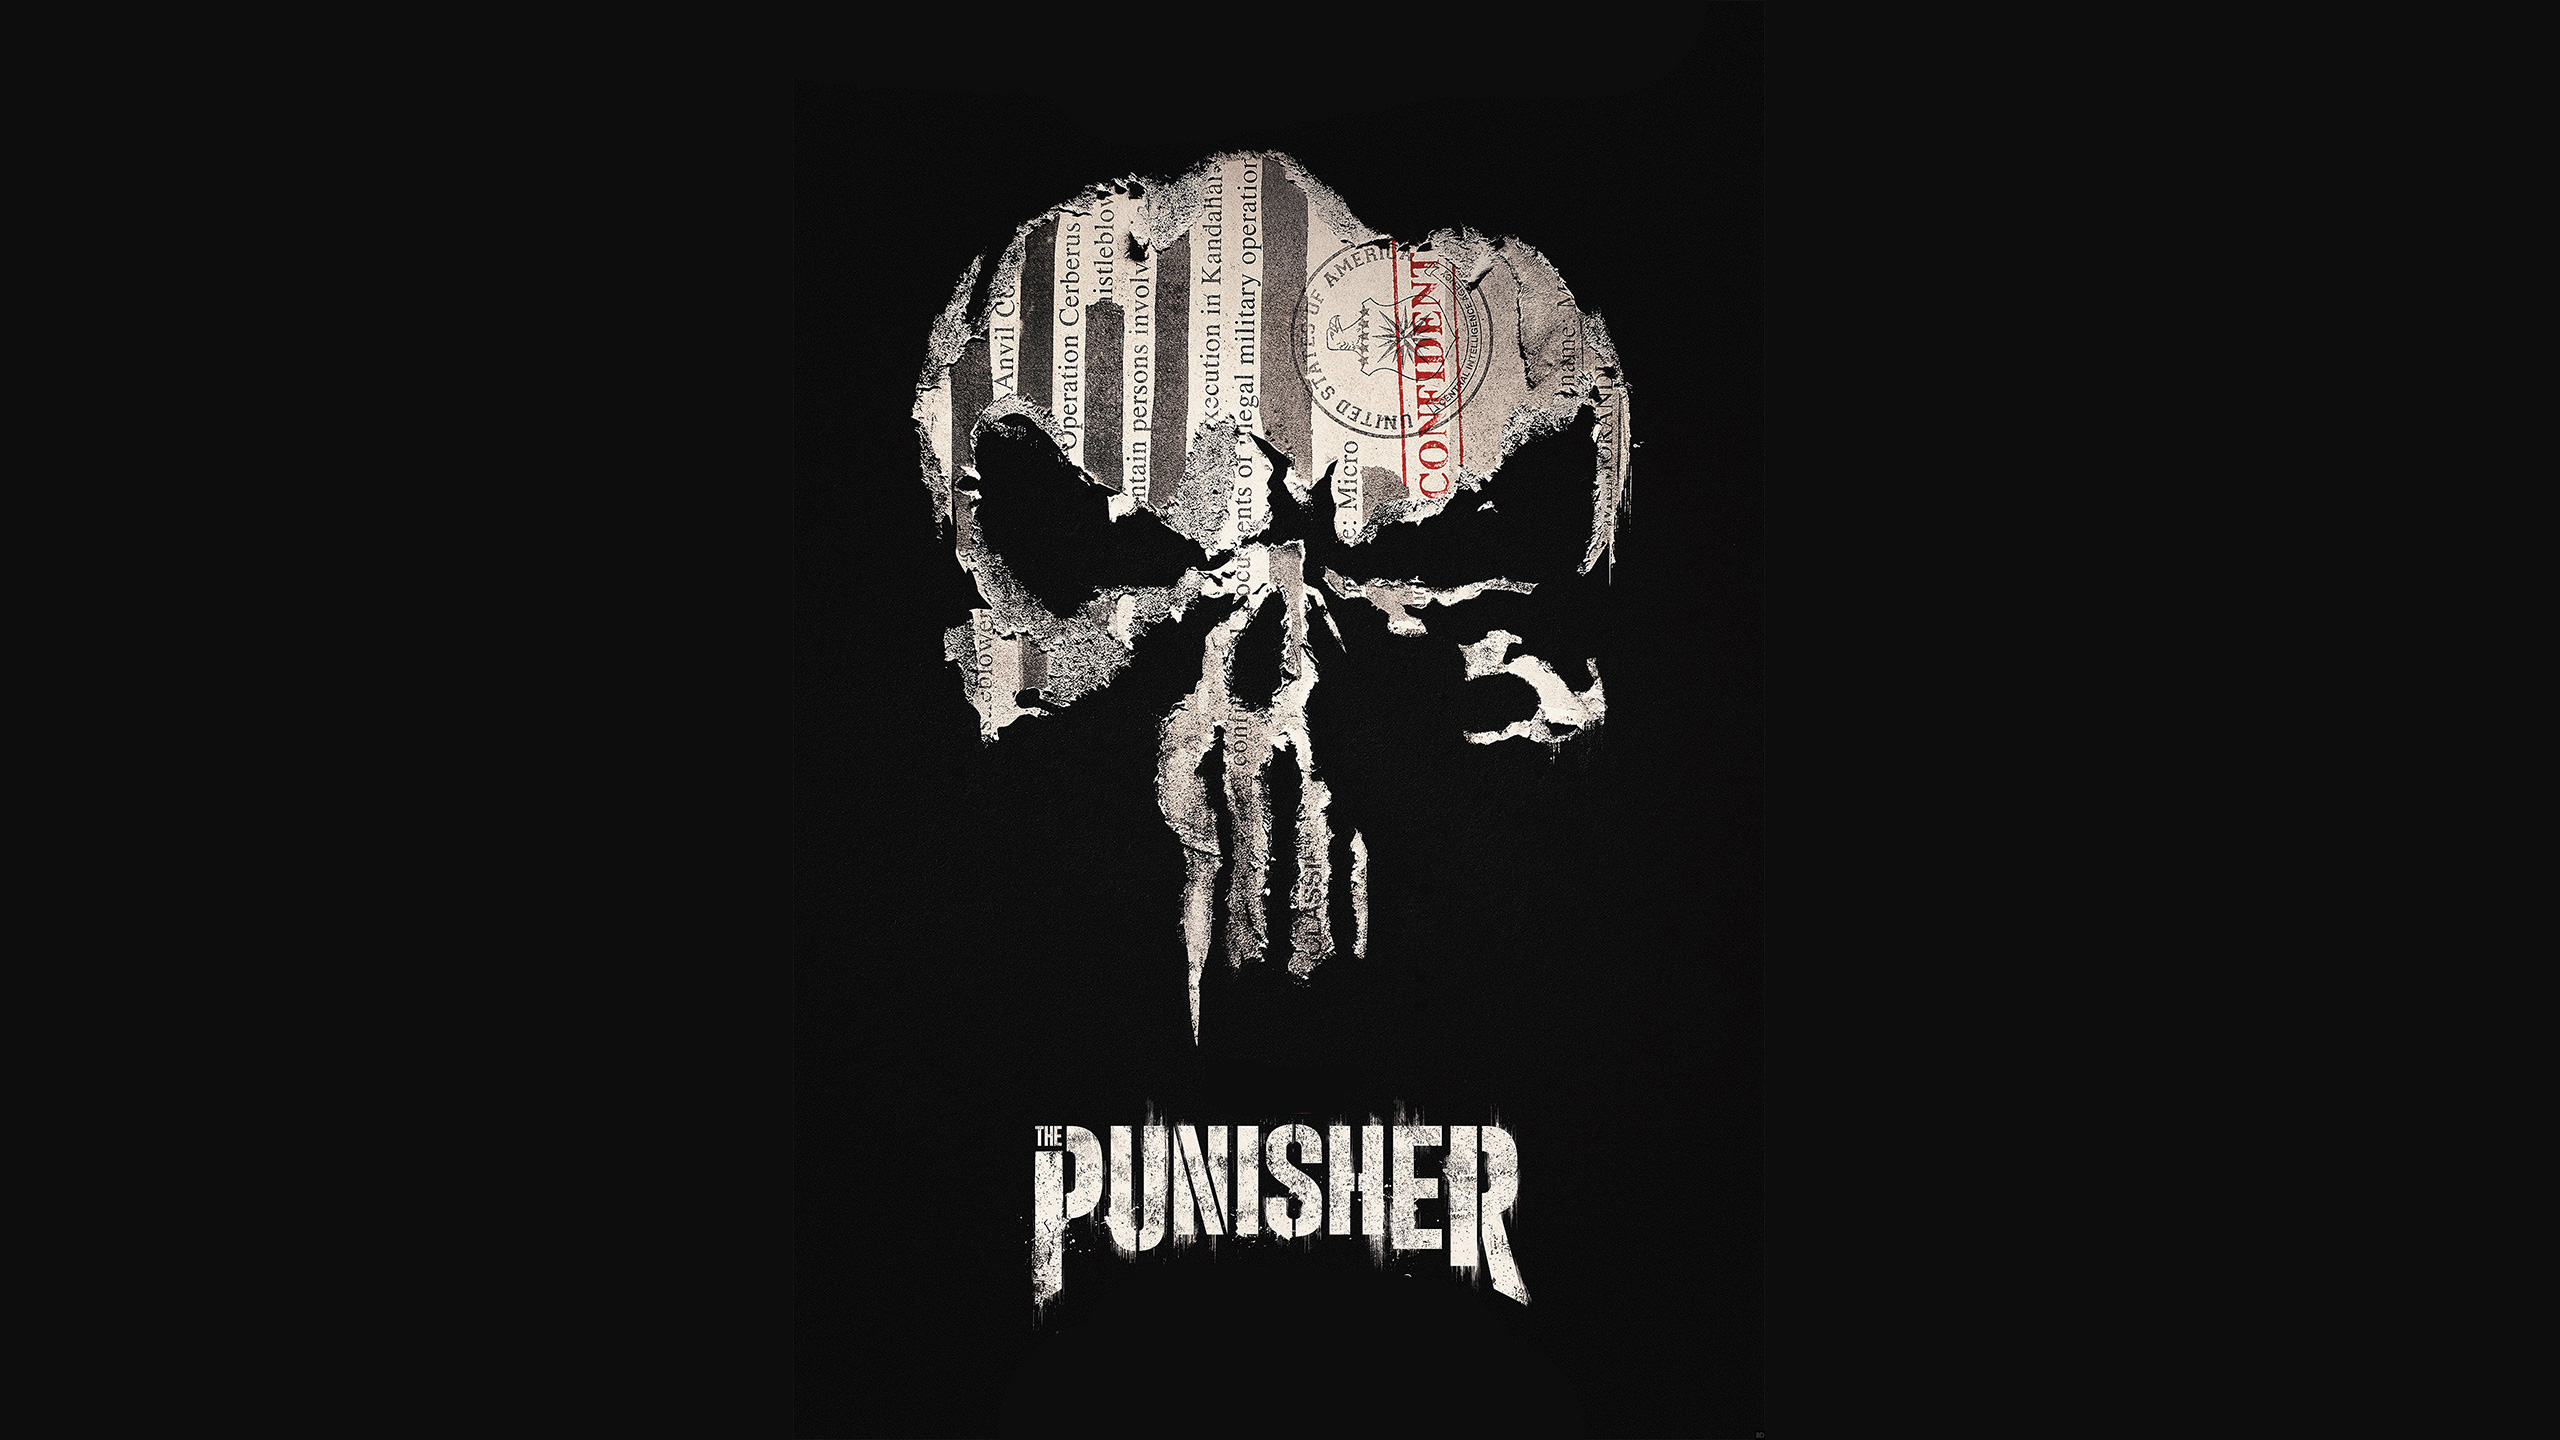 Punisher wallpaper 1920x1080